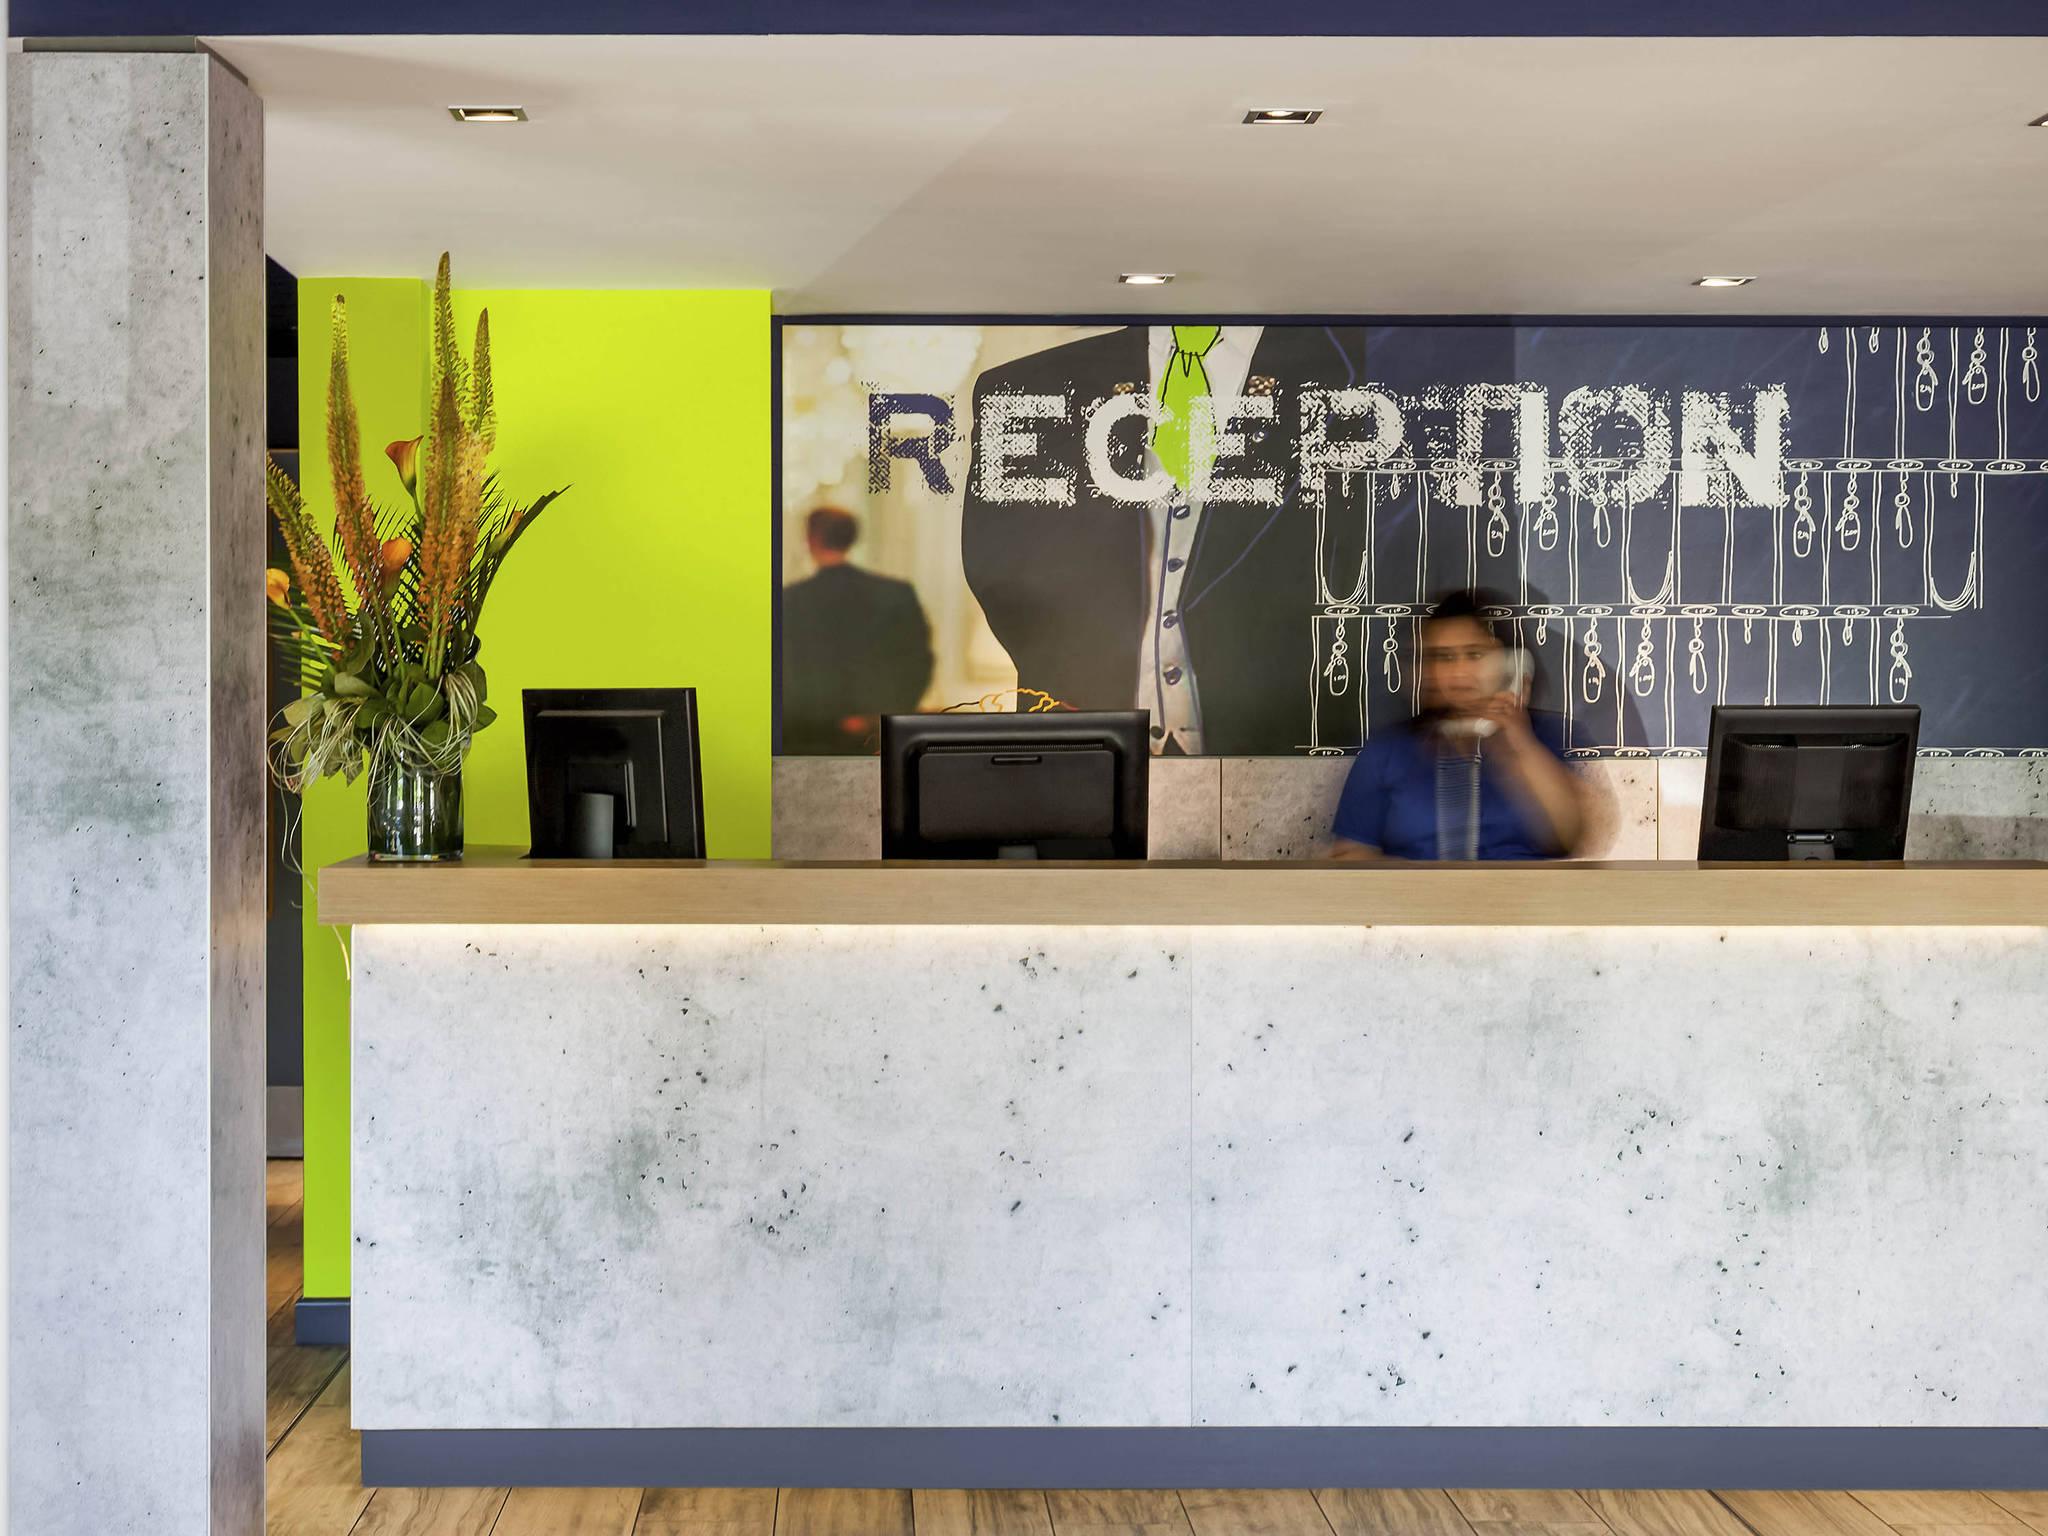 Hotel – ibis budget Londen City Airport